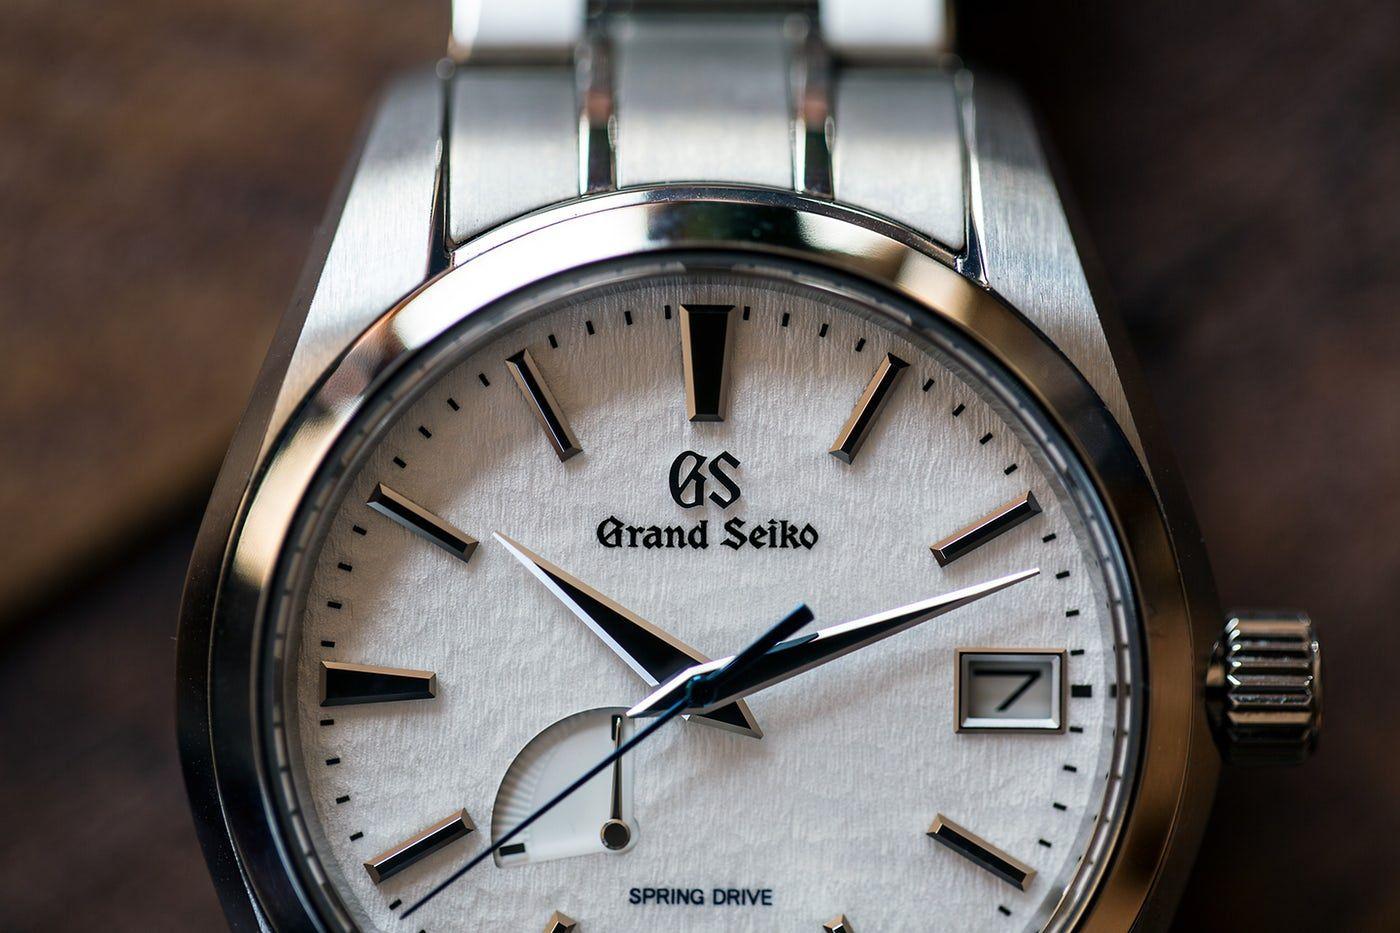 a4154d9e4 A Week On The Wrist: The Grand Seiko Spring Drive Snowflake SBGA211 ...